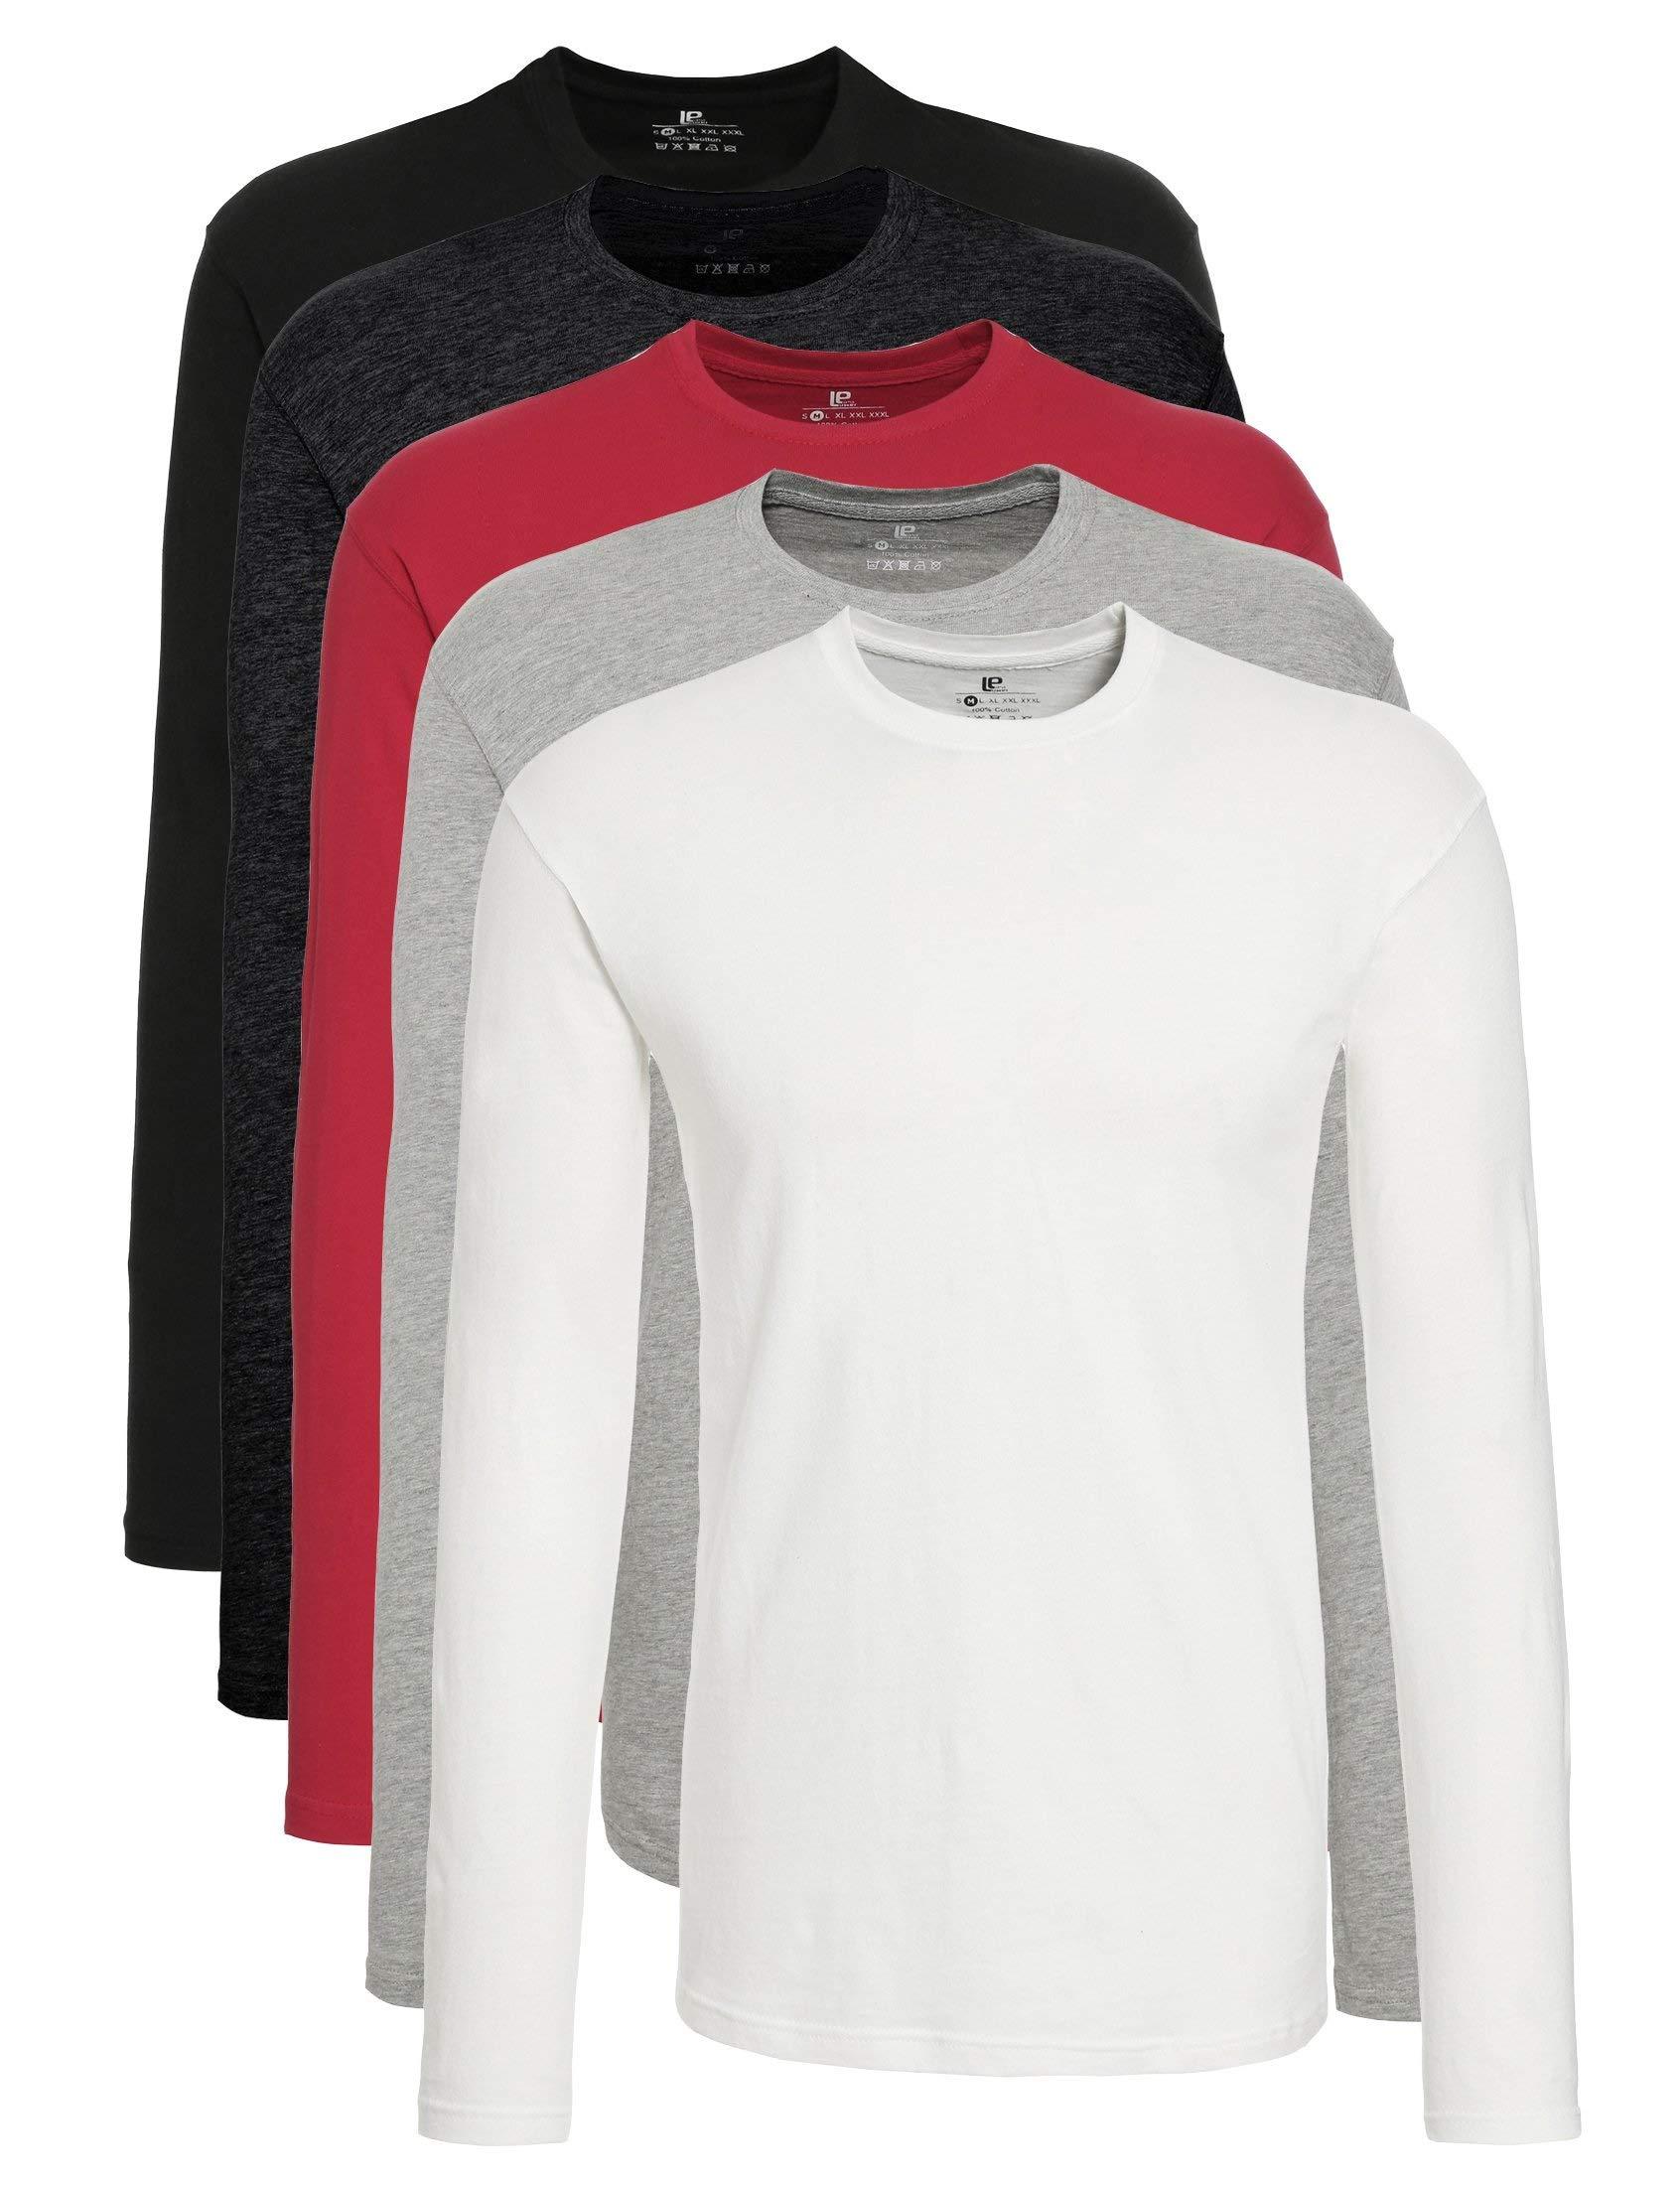 Lower East Camiseta de manga larga Hombre, Pack de 5 product image